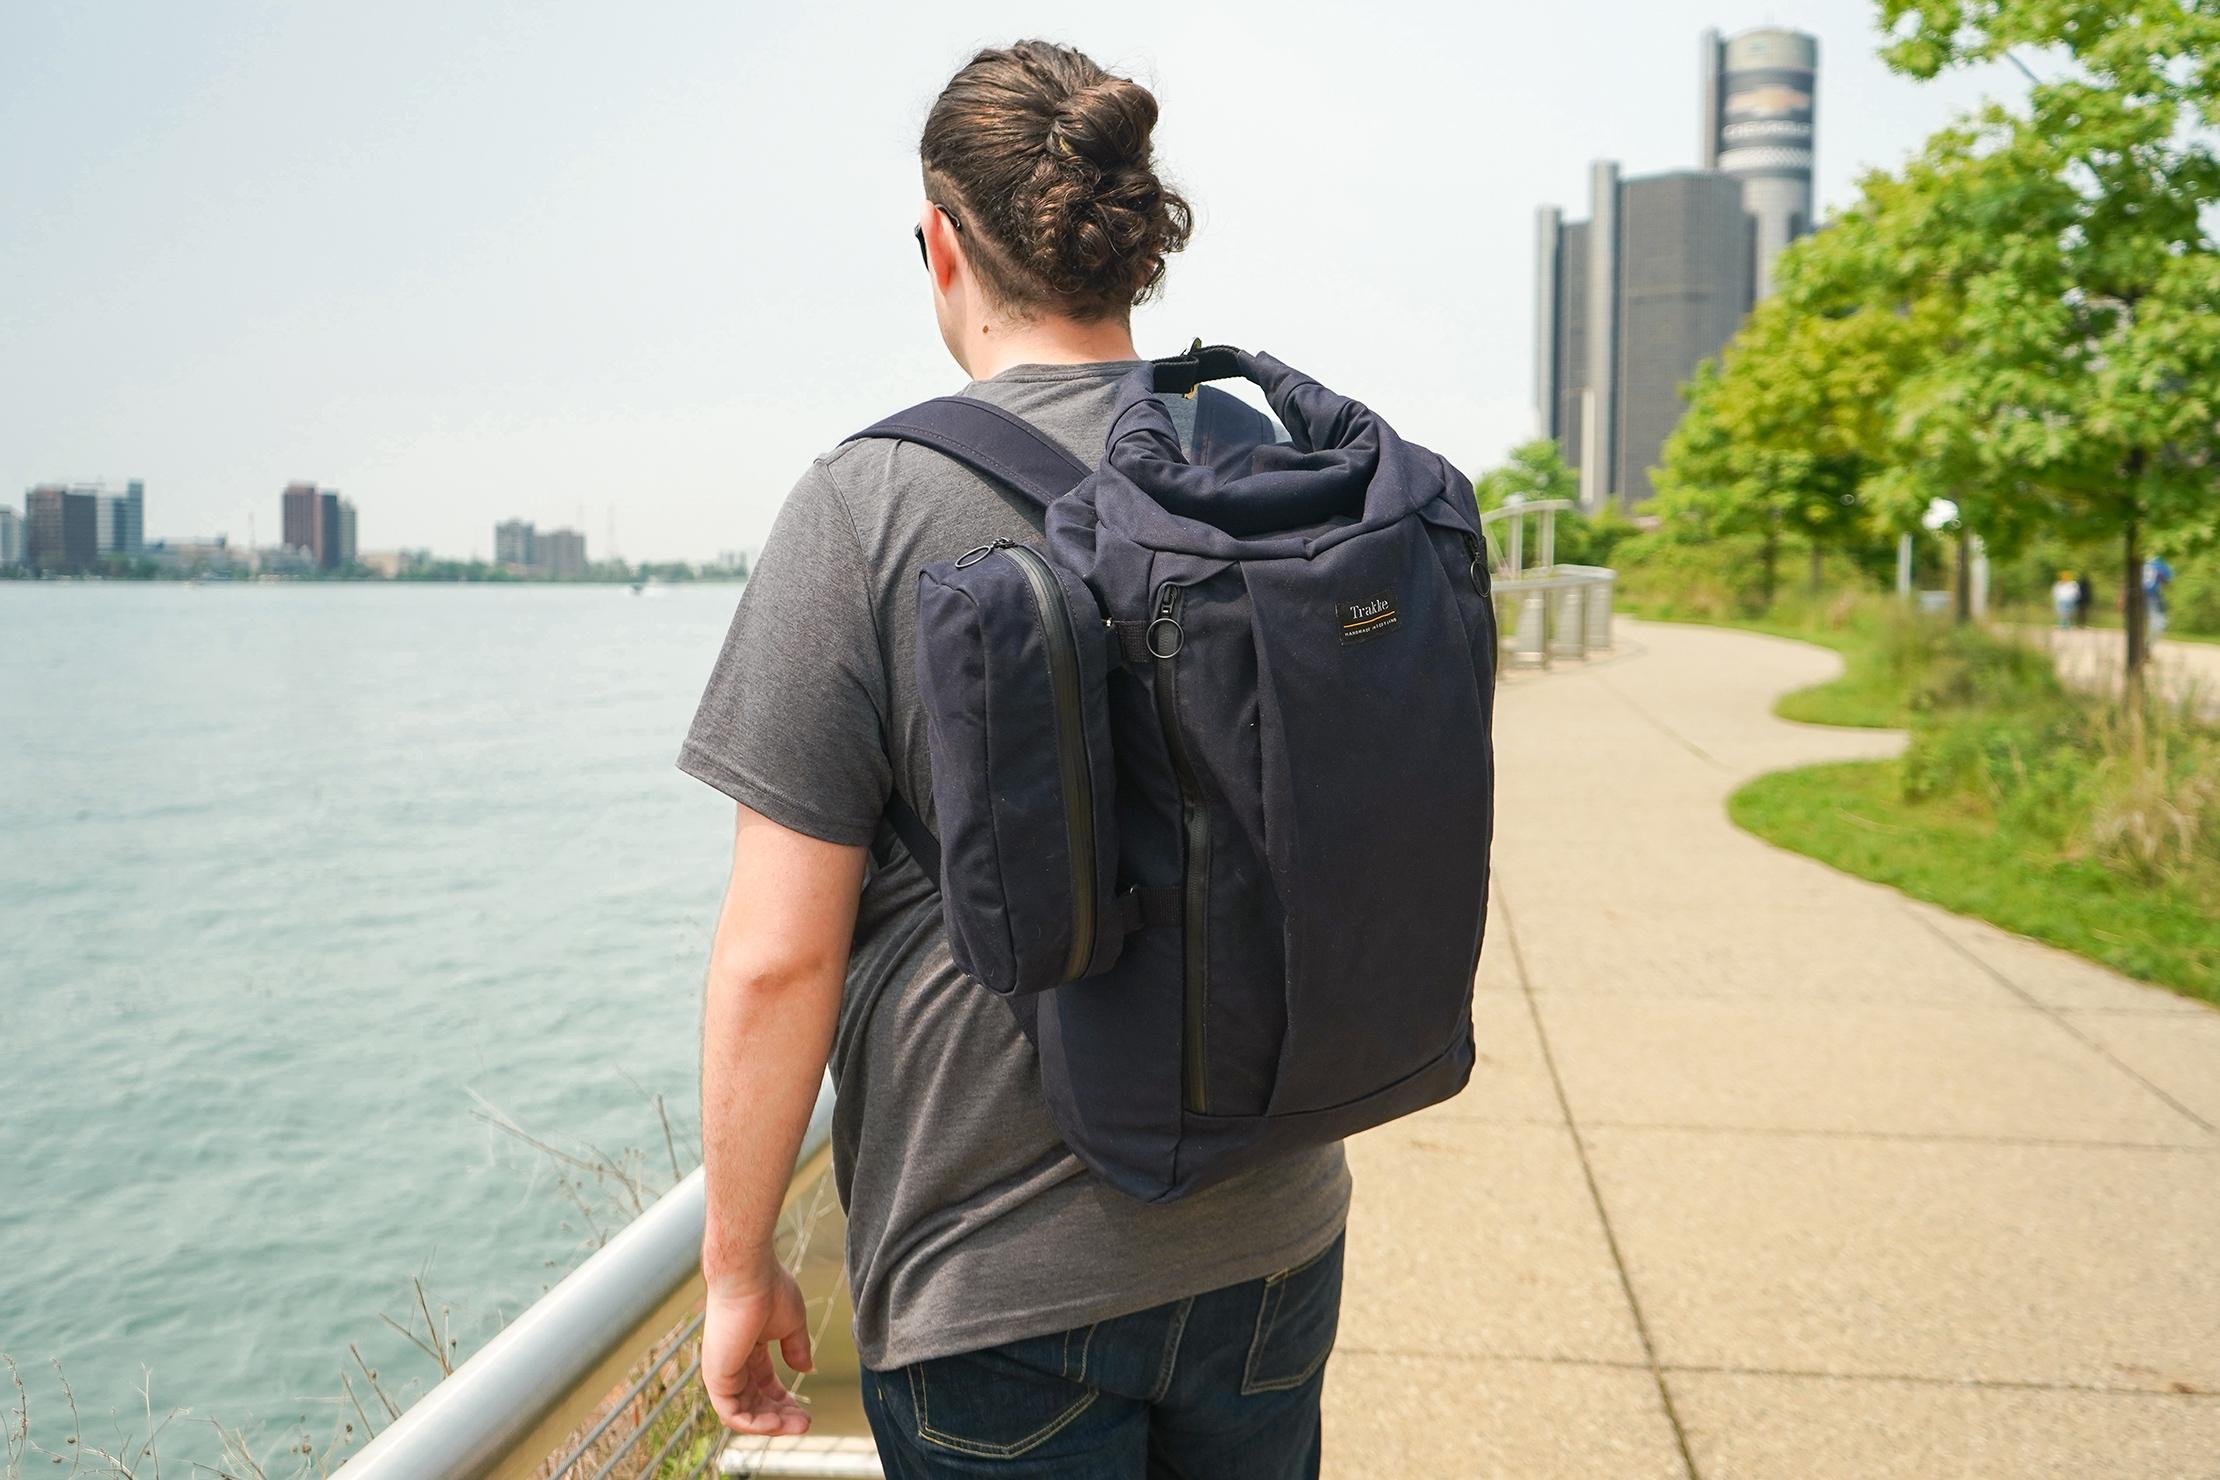 Trakke Laggan Travel Accessory Pouch 2019 Attached To The Trakke Vorlich In Detroit, Michigan